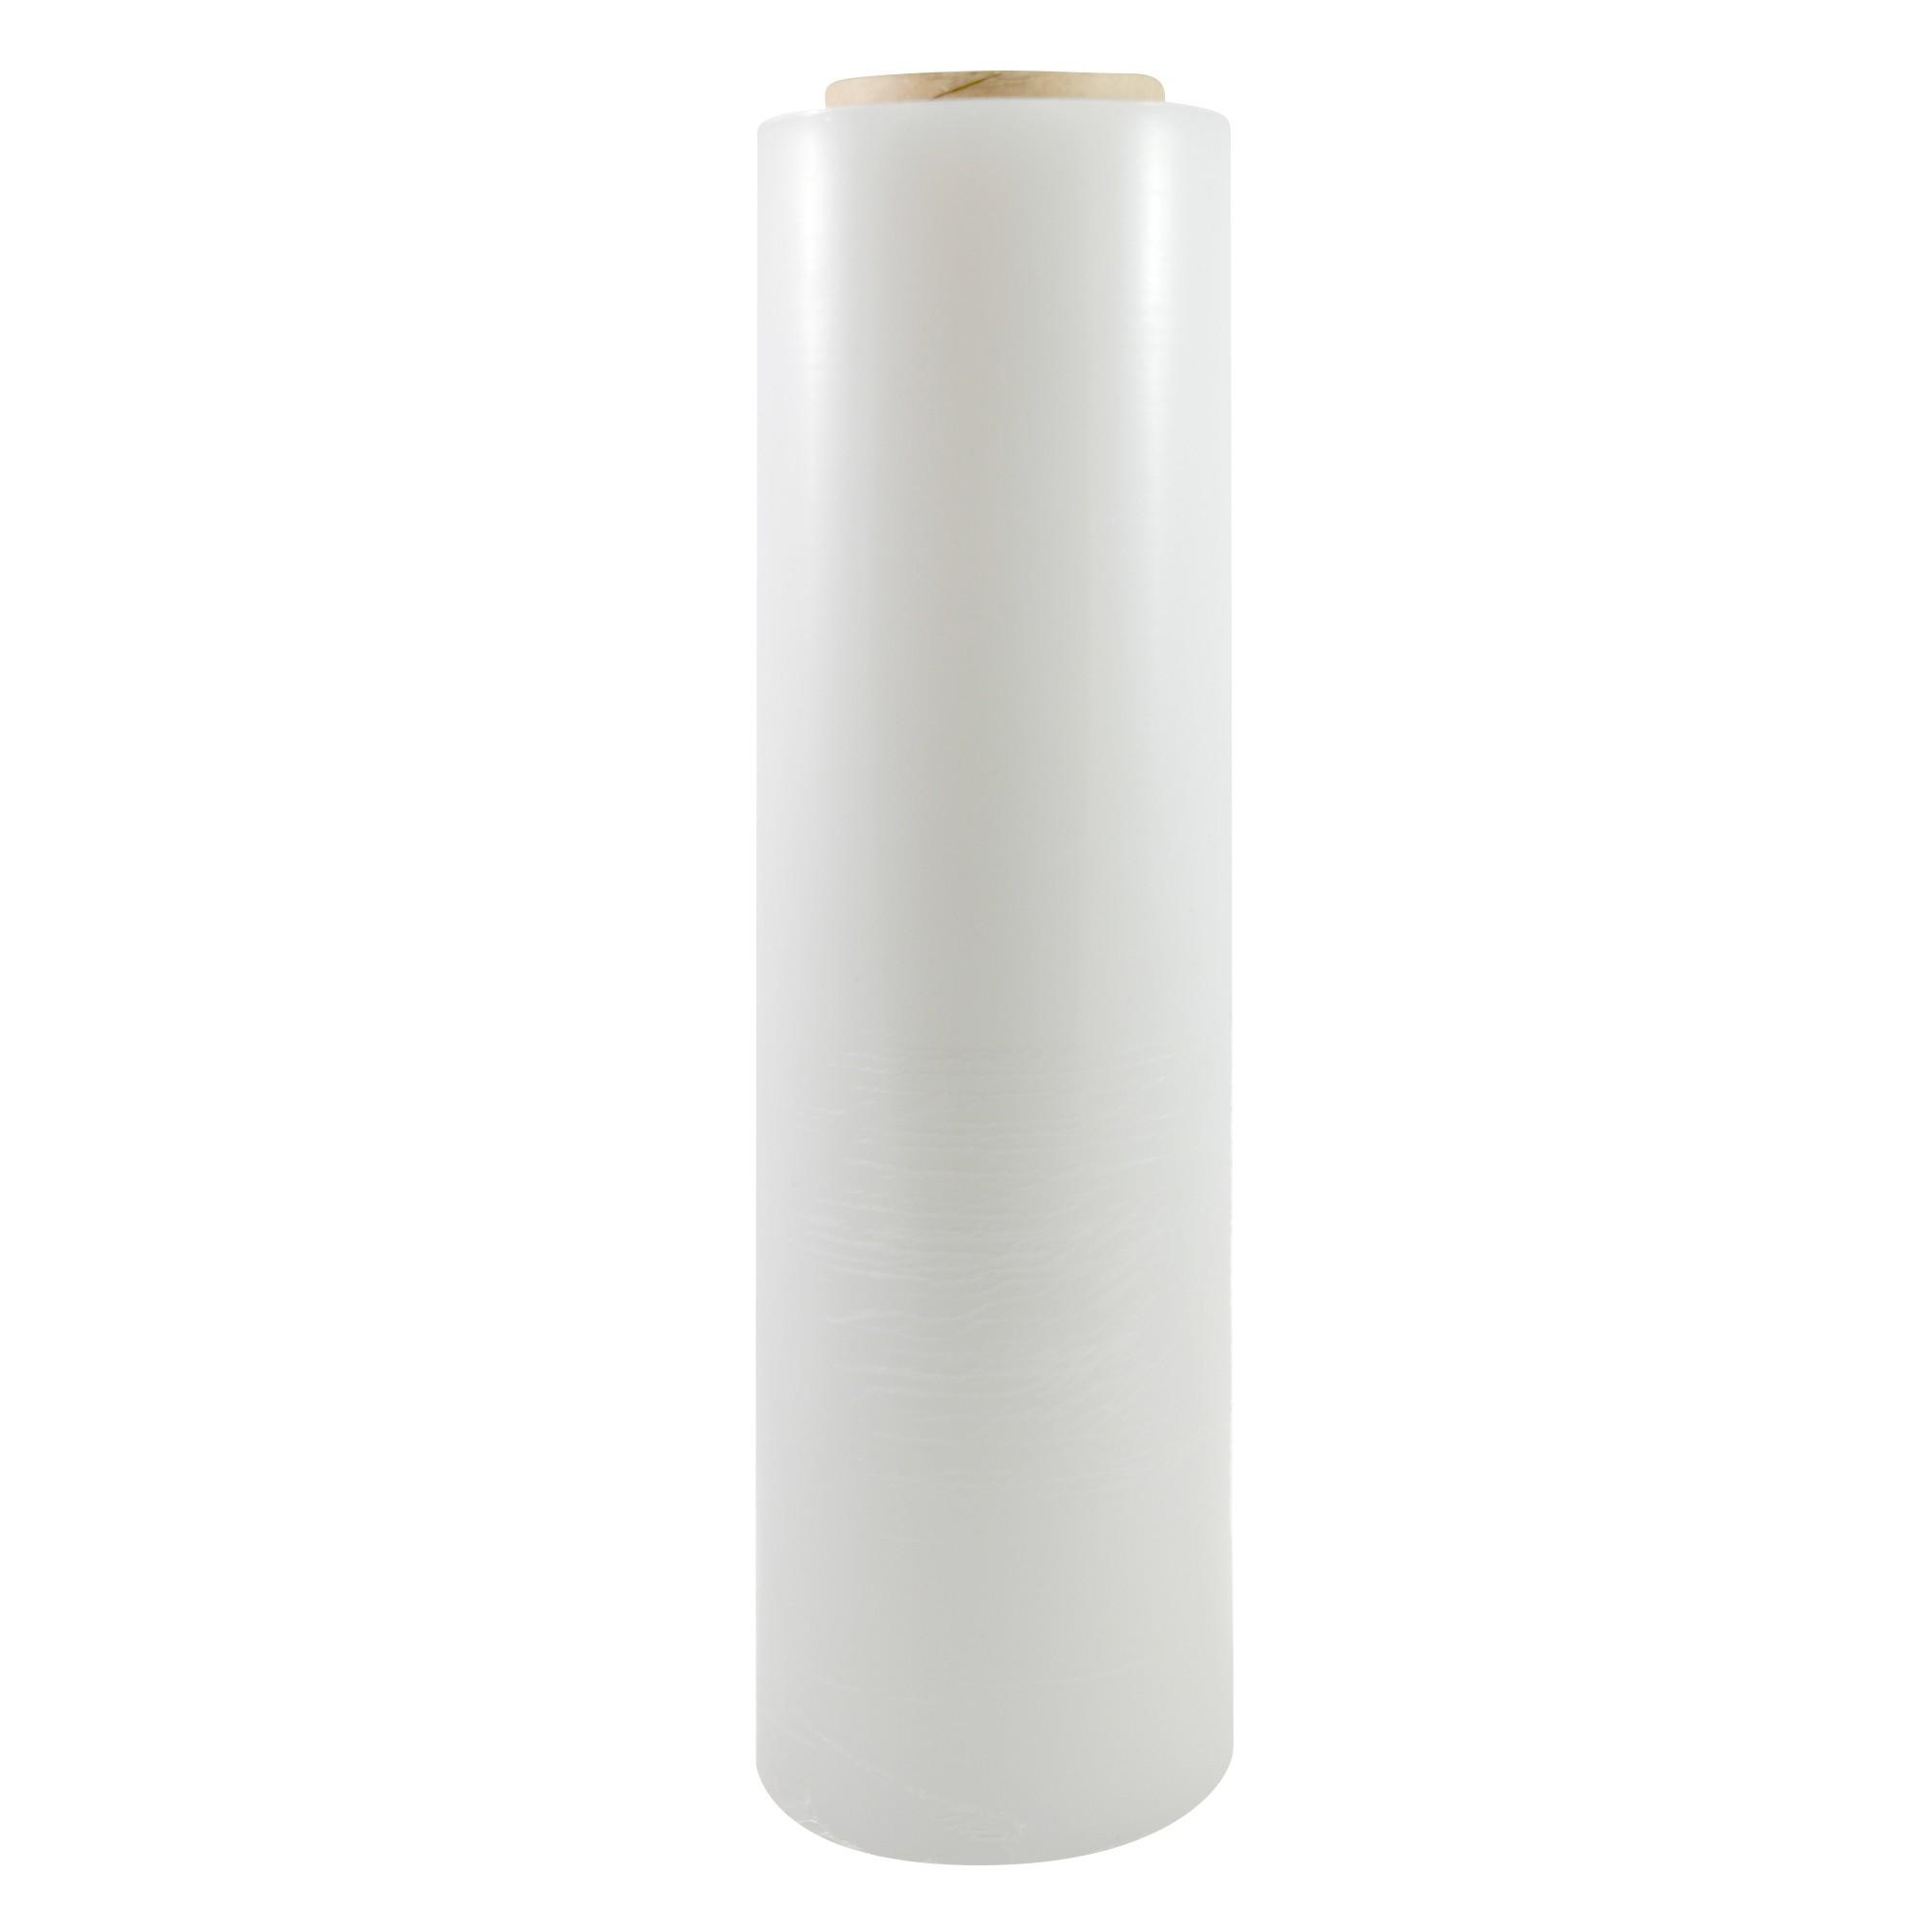 "TOTALPACK® 18"" x 1500' 80 Gauge, 4 Rolls. Gauge Blown Stretch Clear Film"